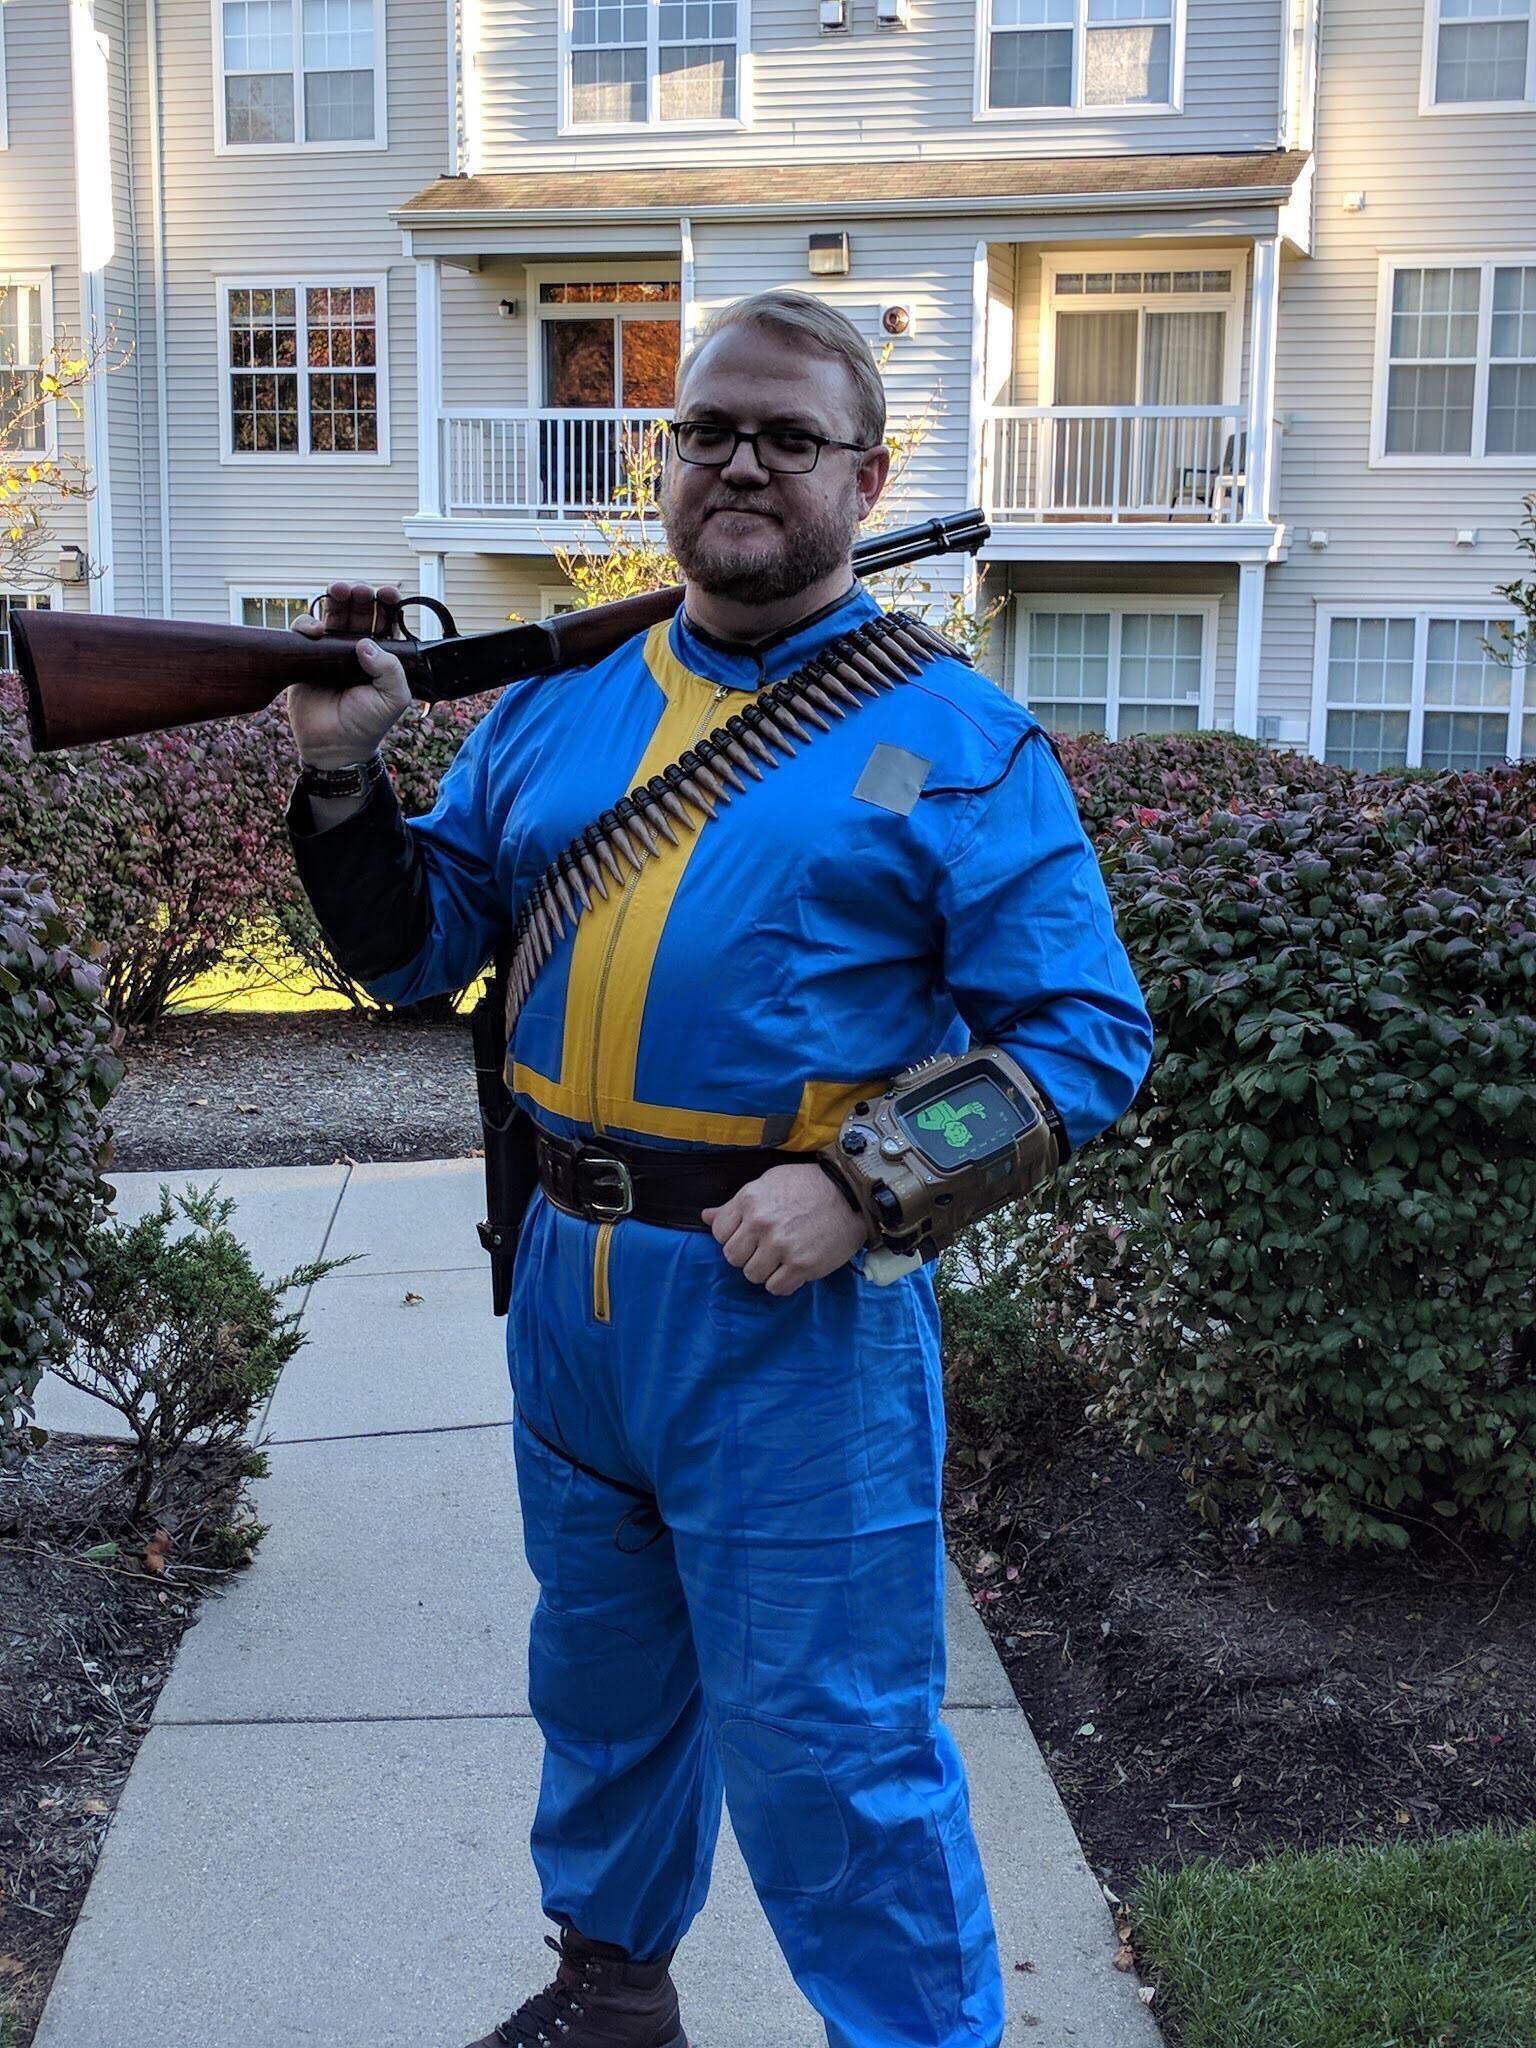 Fallout vault boy costume